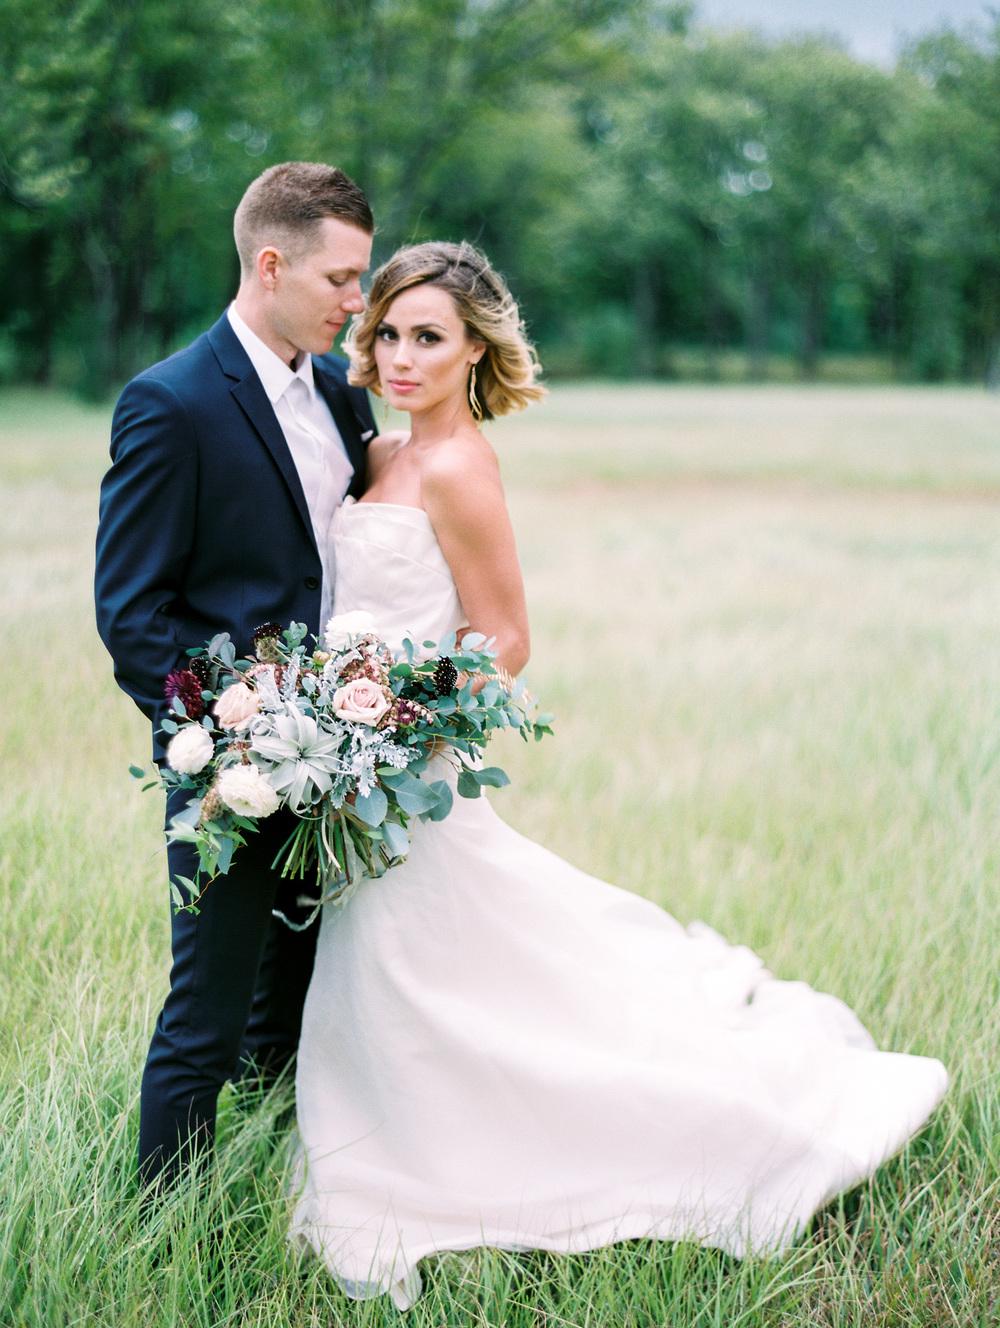 Dana-Fernandez-Photography-Houston-Wedding-Photographer-Film-100-Layer-Cake-Wedding-Inspiration-Destination-17.jpg